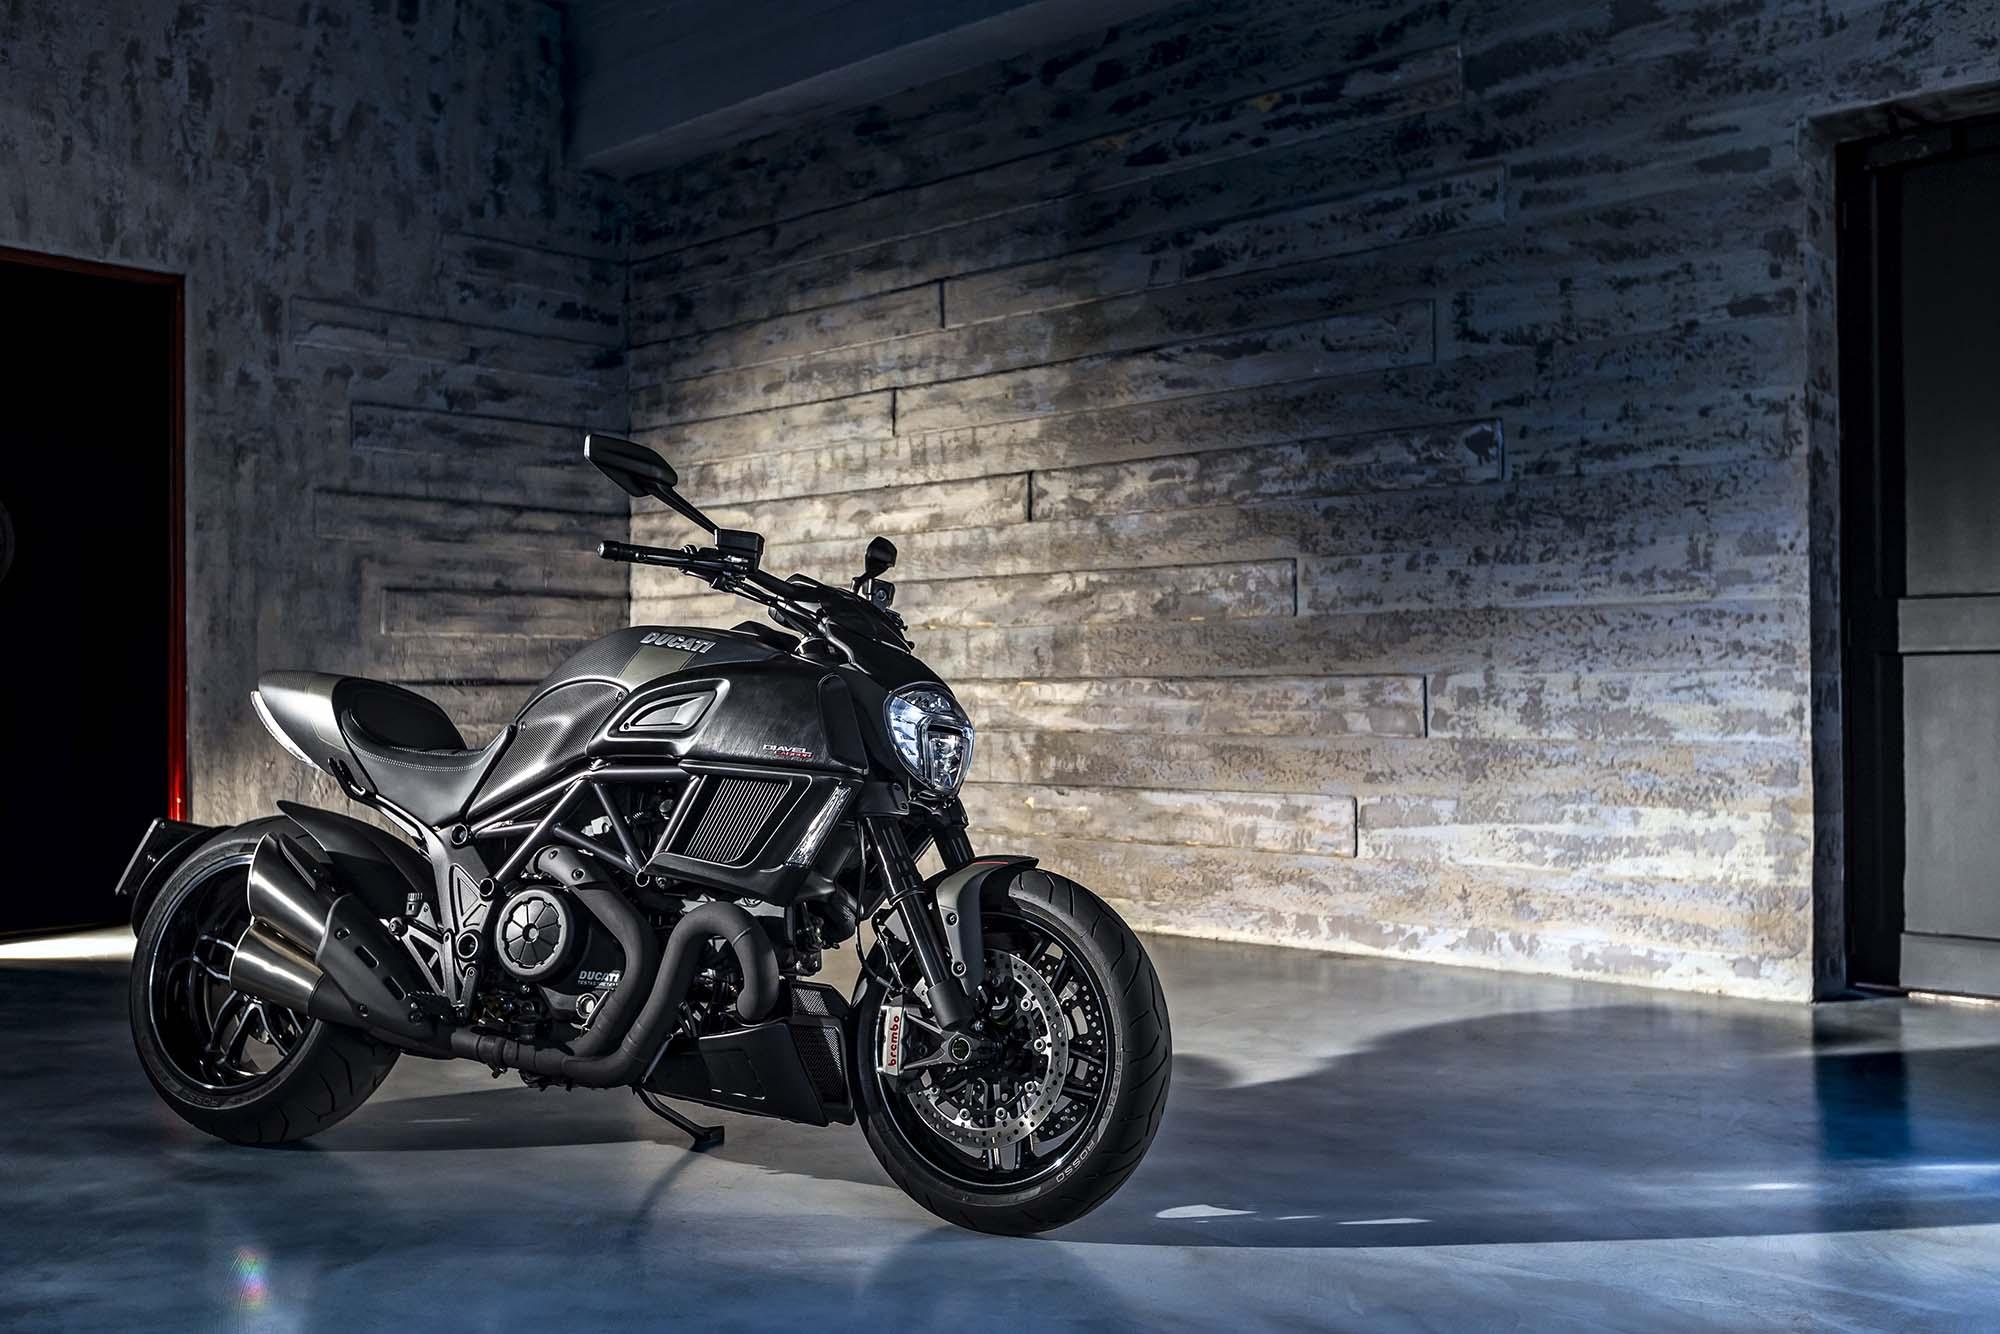 Ducati Diavel Owners Review